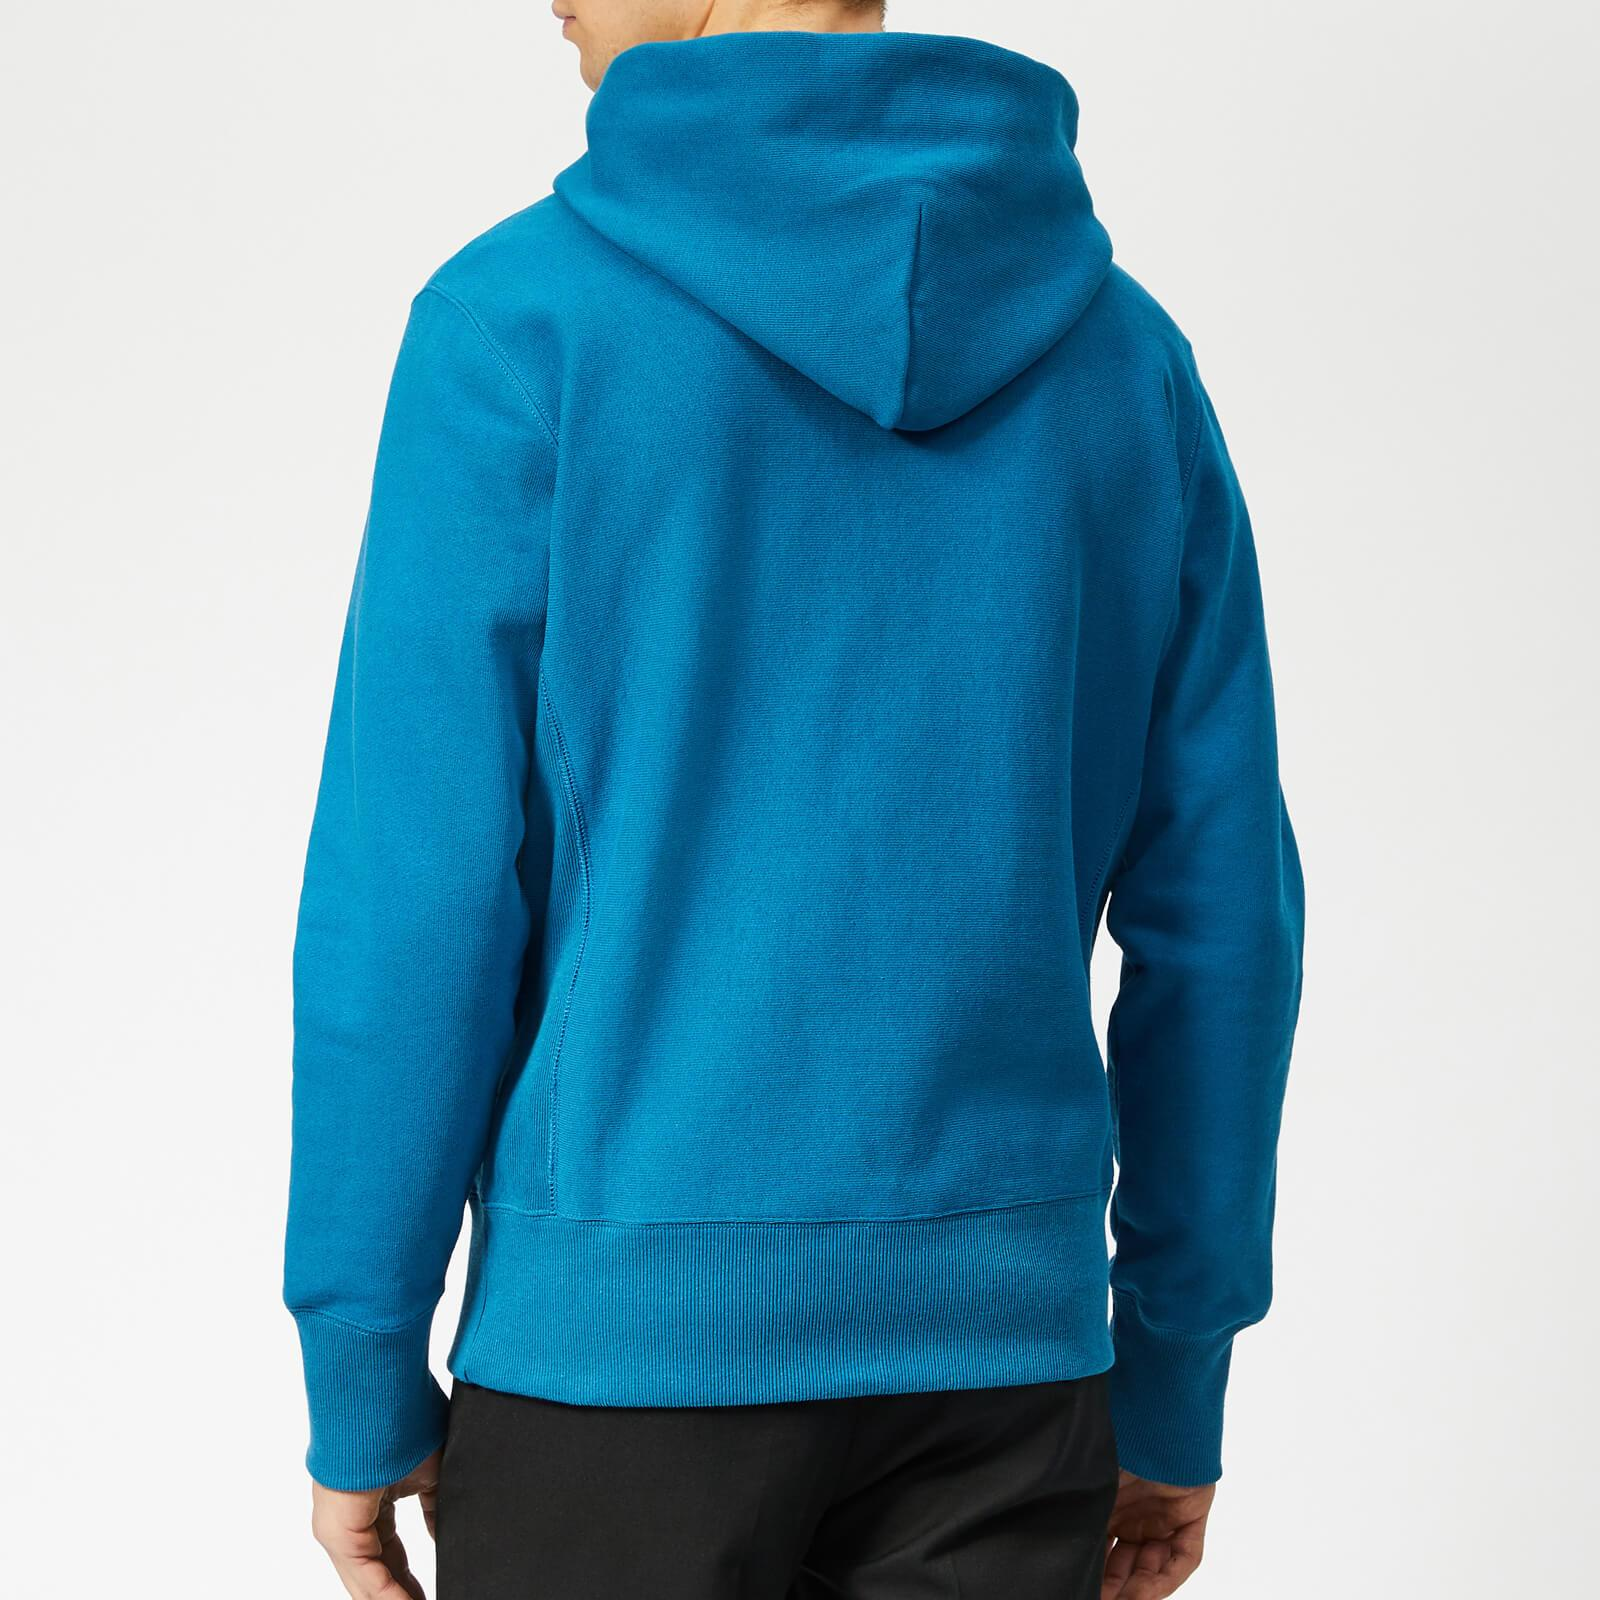 0f22579f9c2 Champion - Blue Half Zip Over Head Hoodie for Men - Lyst. View fullscreen